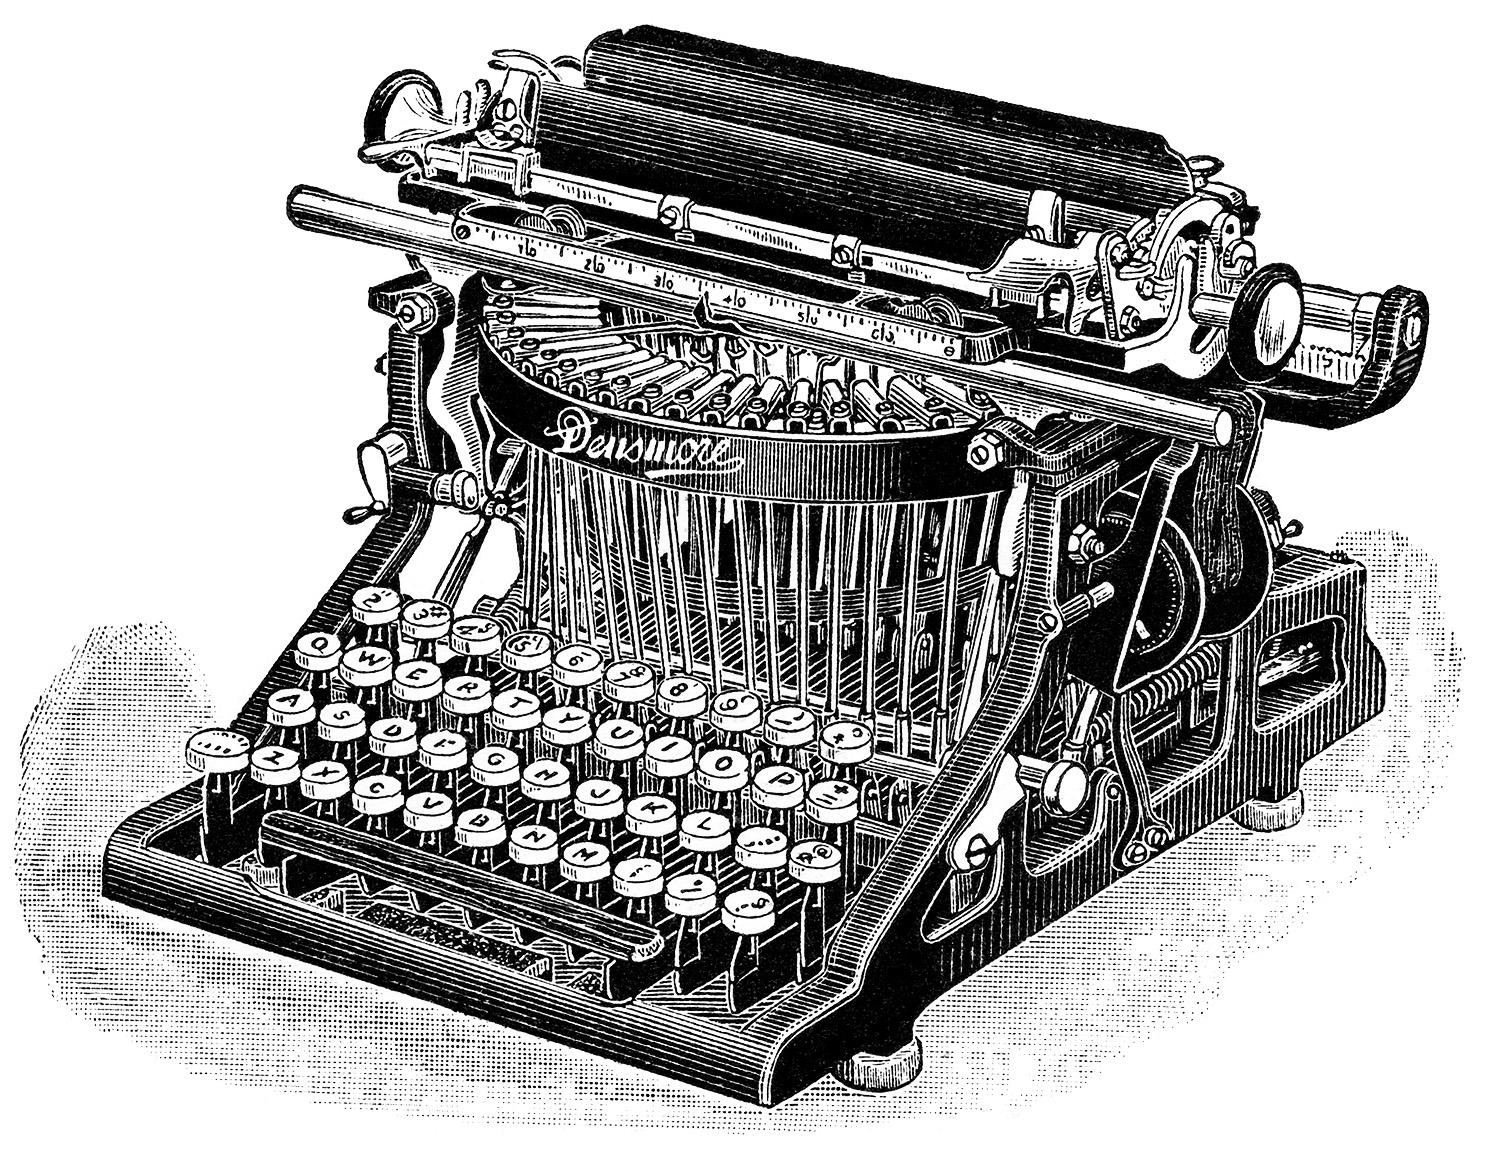 Free Vintage Clip Art Densmore Typewriter | Old Design ...